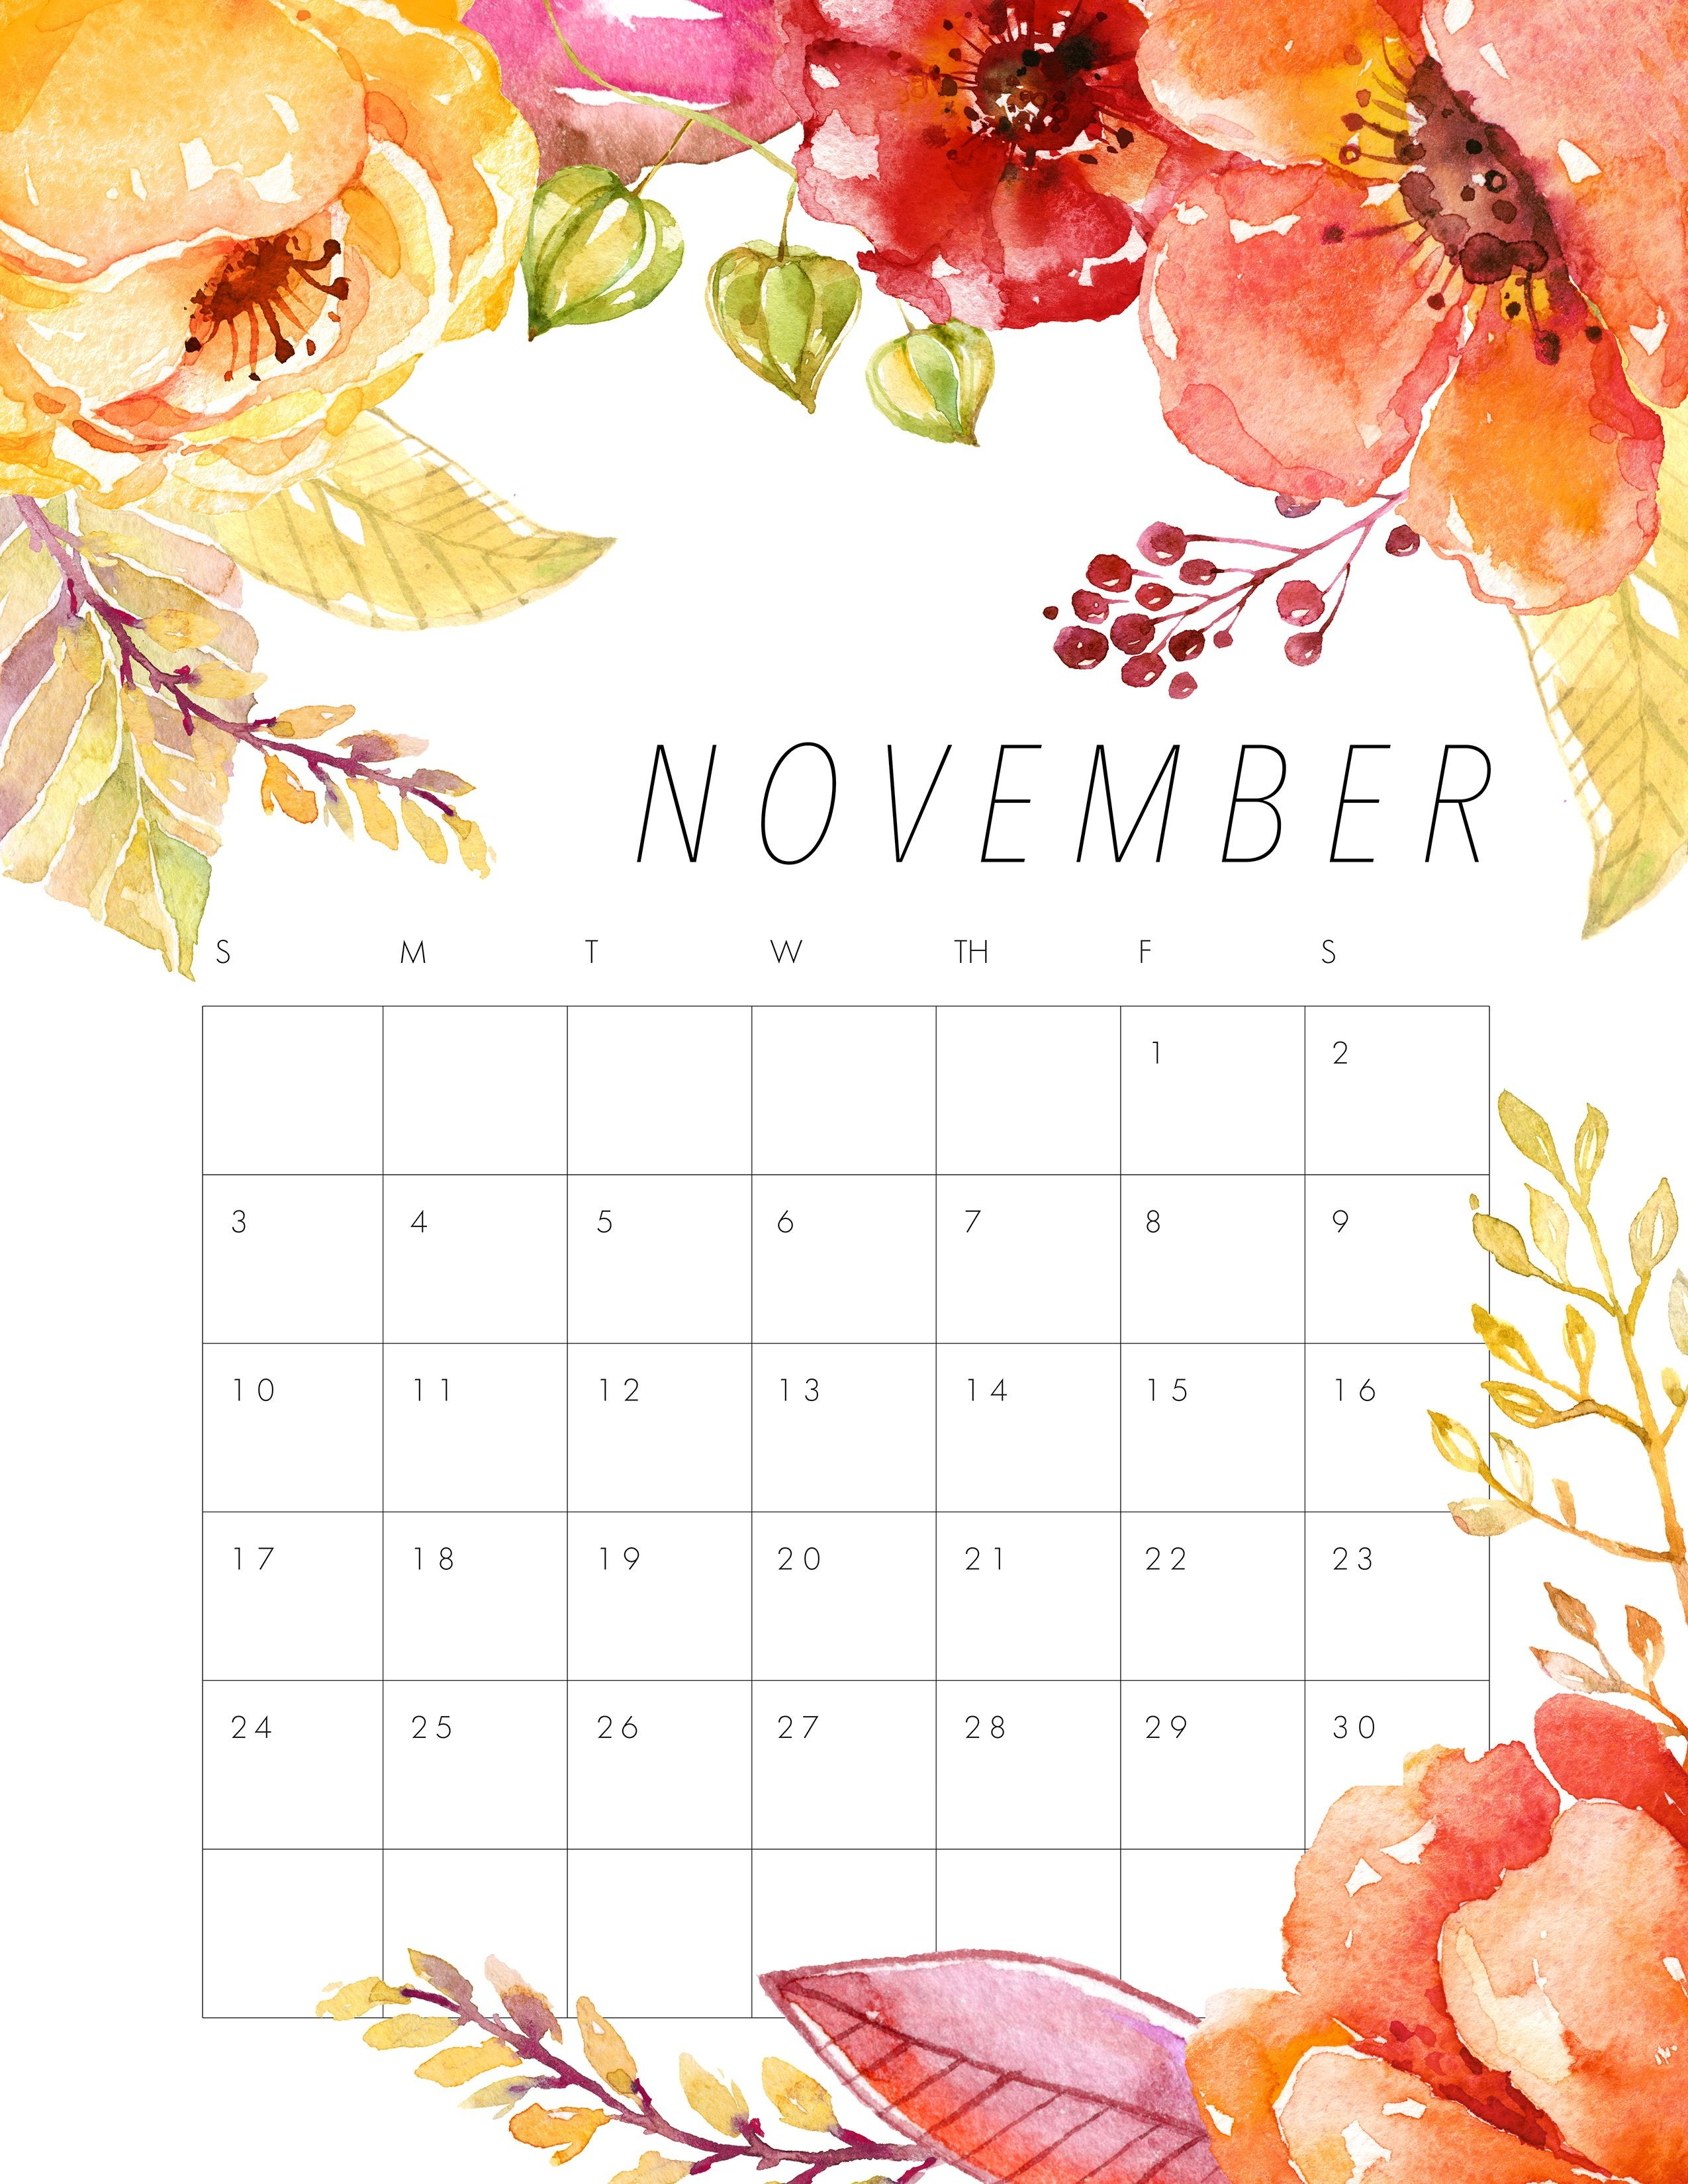 Calendario 2019 Y 2019 Más Recientemente Liberado Pin Od Použvateľa Iva Smatana Na Nástenke Planner 2019 Of Calendario 2019 Y 2019 Más Recientes Urdu Calendar 2018 Usa